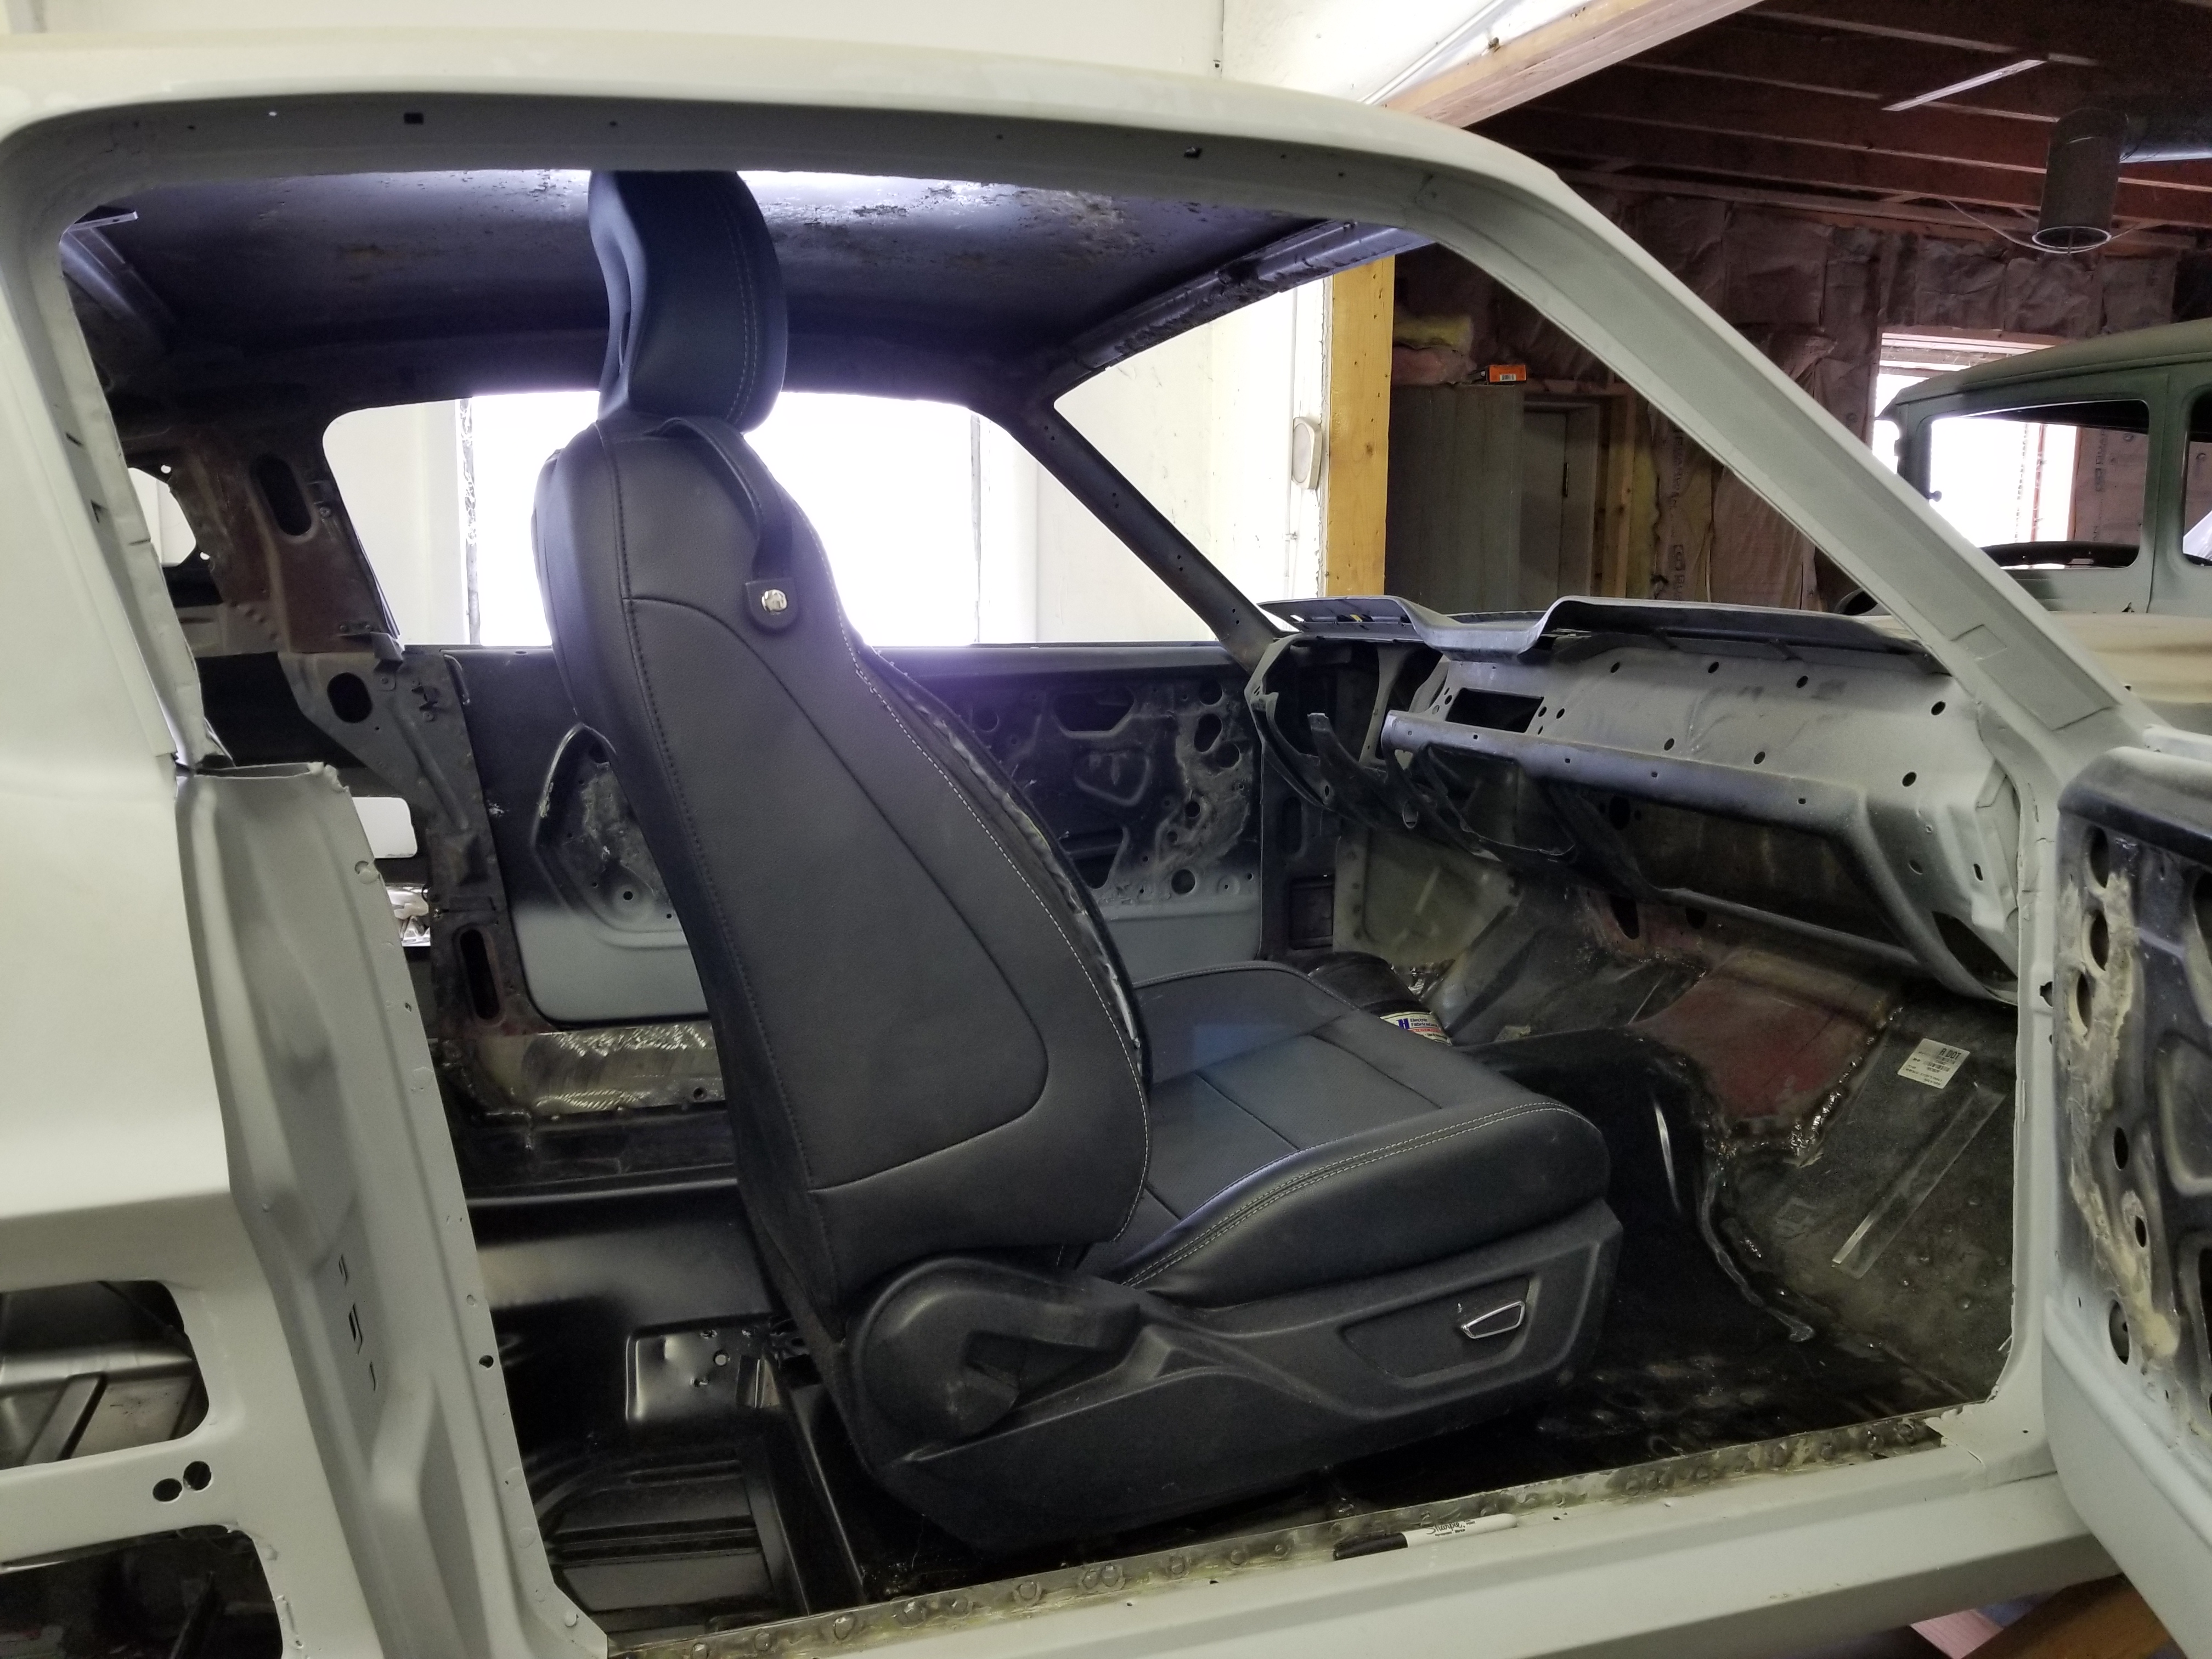 2015 Mustang Power Seats